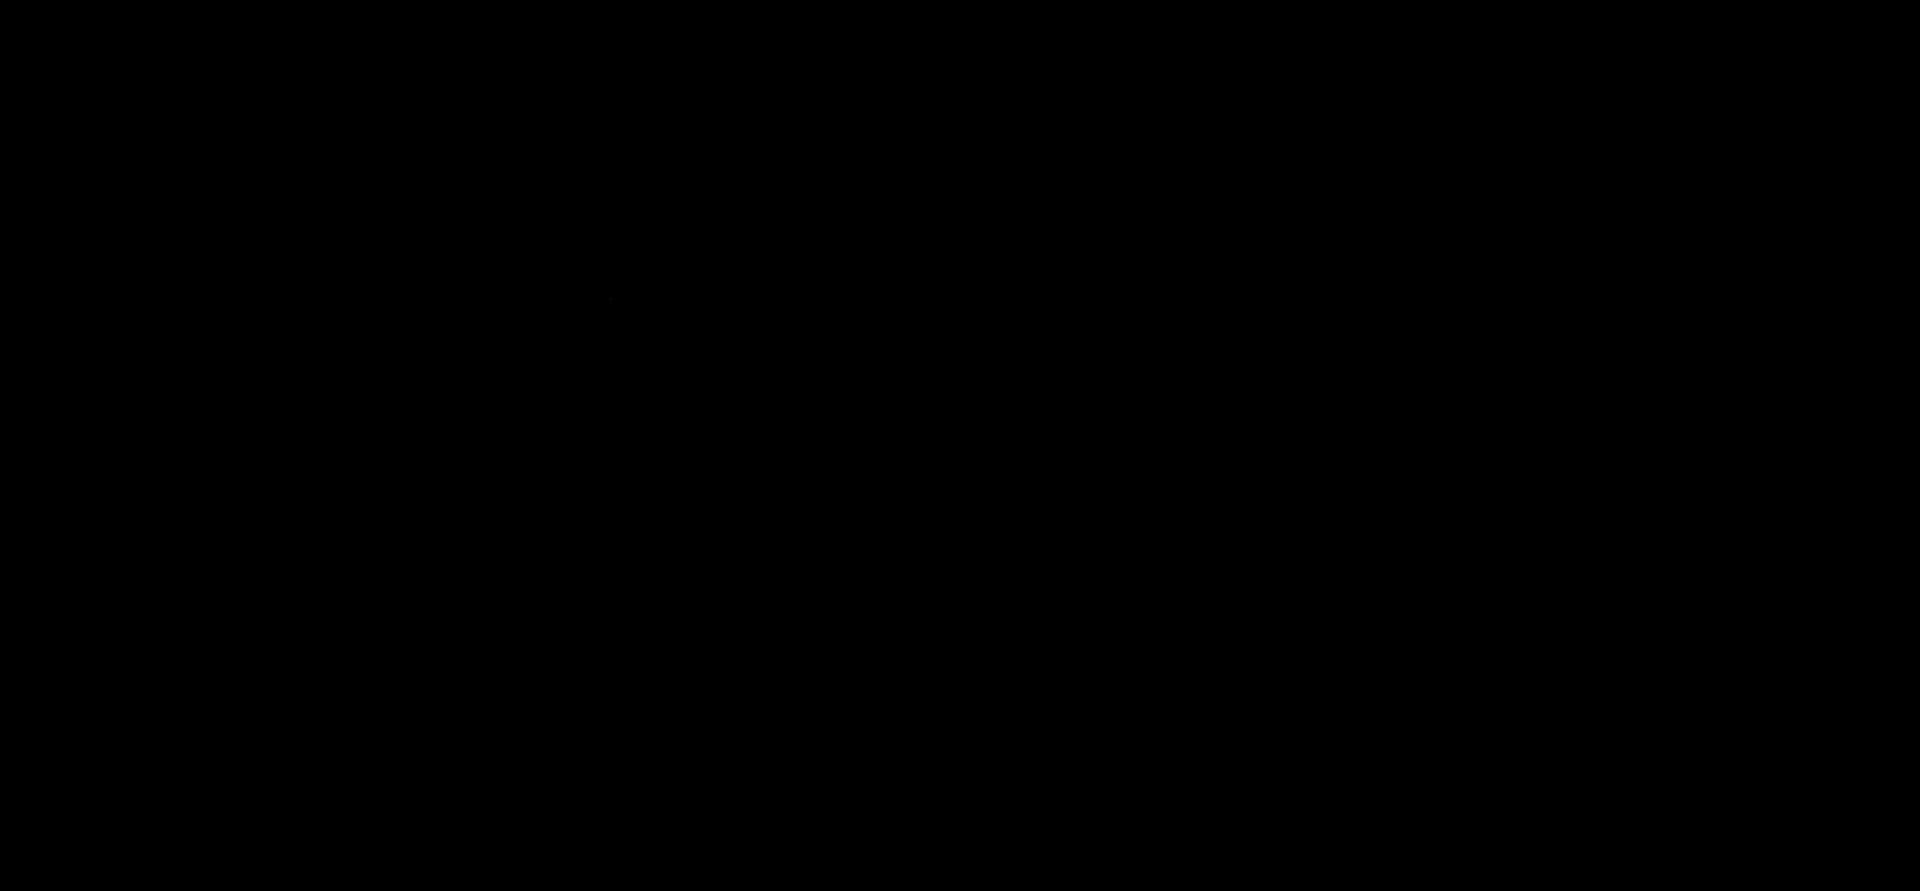 1920px-Standard_Cygnus_vs_Enhanced_Cygnus.png